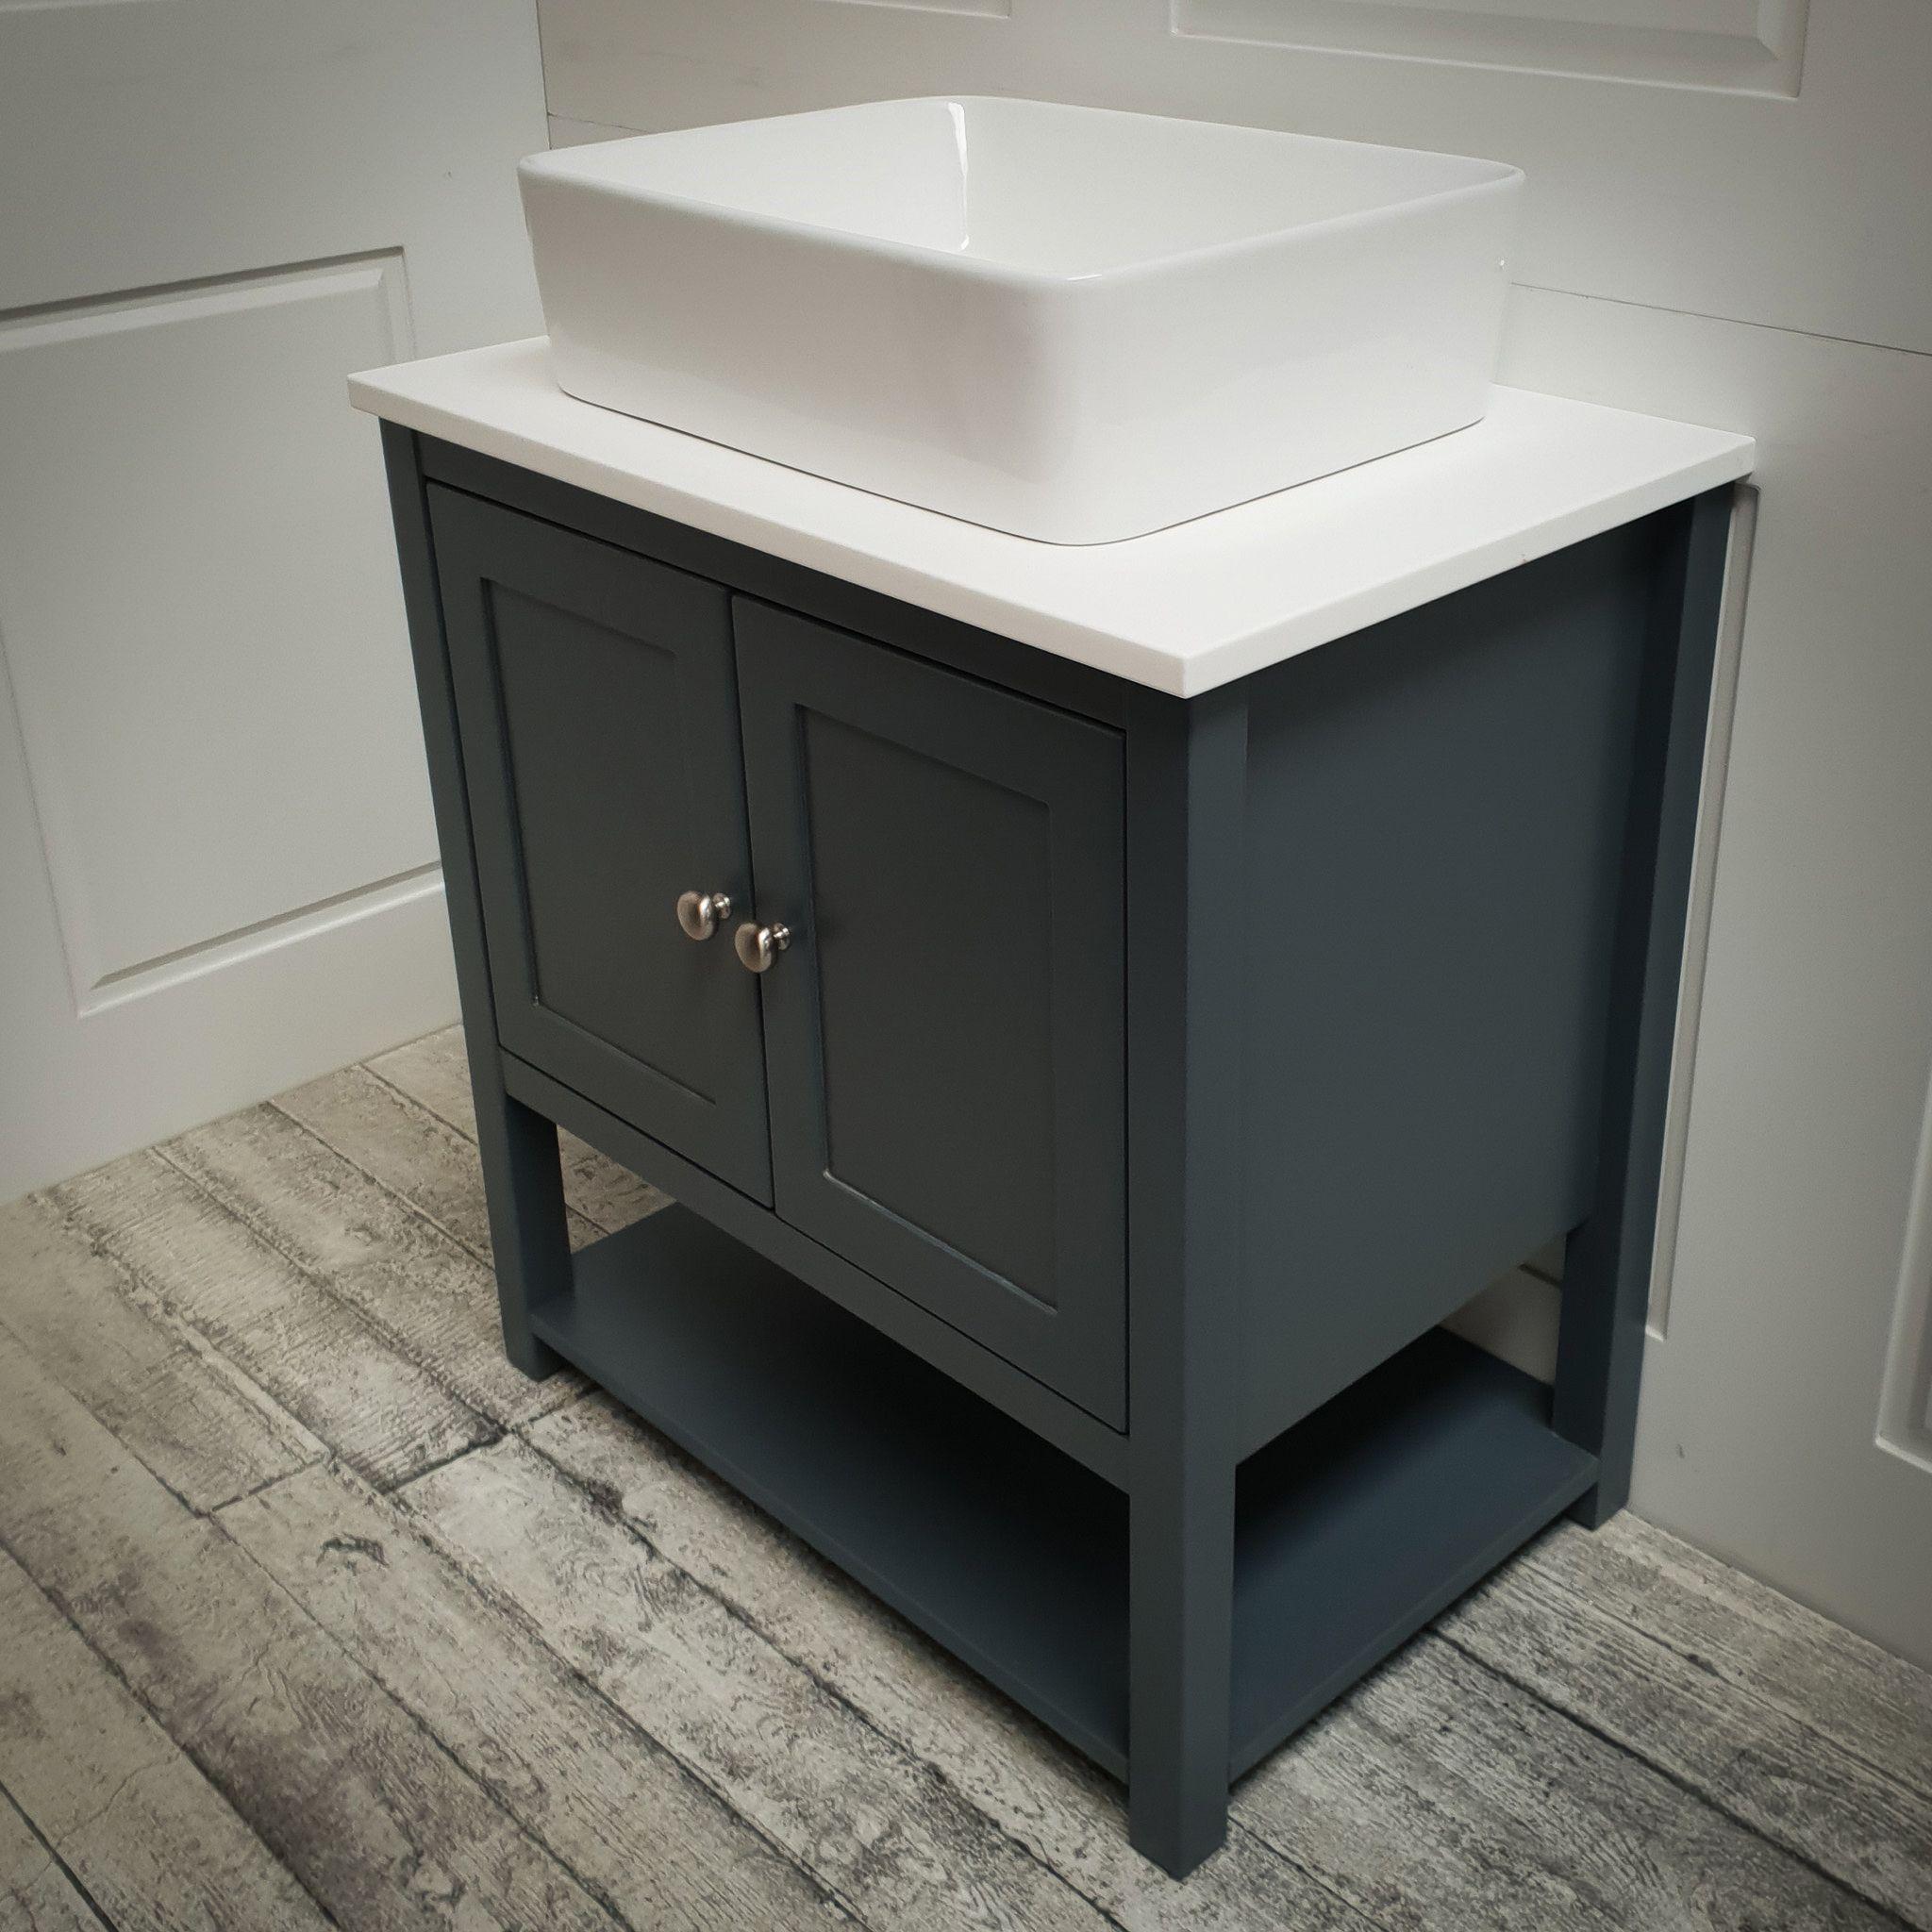 Ava Door Vanity Unit Single Sit On Basin Bathroom Sink Vanity Units Bathroom Vanity Units Bathroom Sink Units